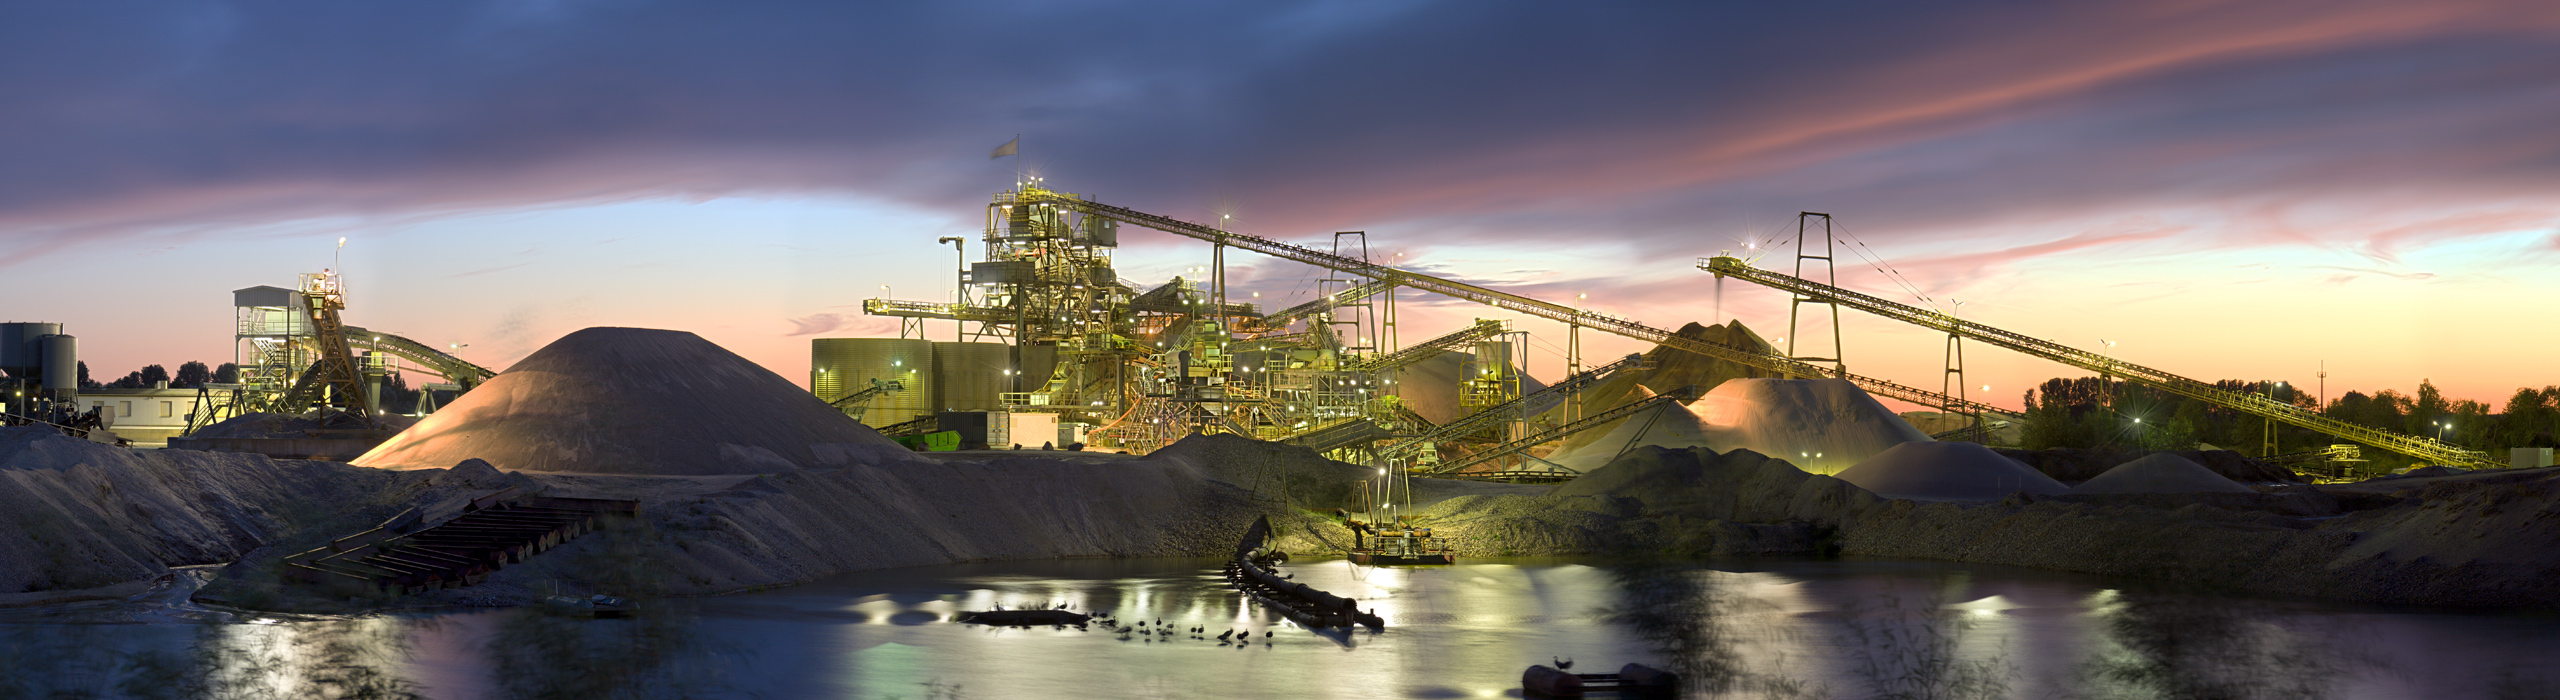 Bellmer Separation Technology Mining